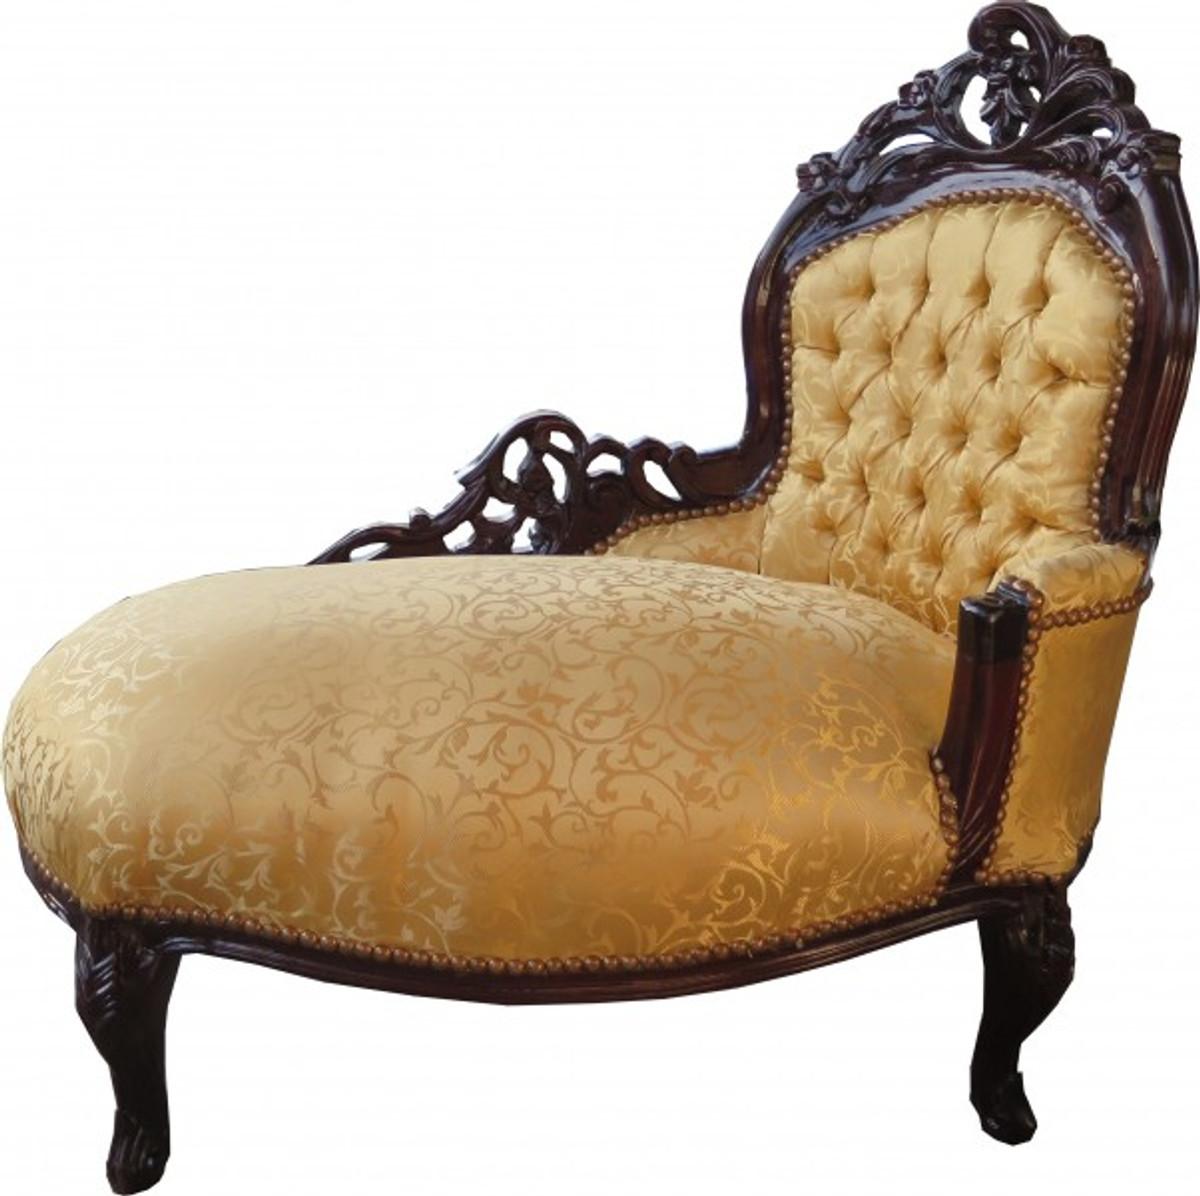 Casa Padrino Barock Kinder Chaiselongue Gold Muster / Mahagoni Braun  - Recamiere Kindermöbel 1